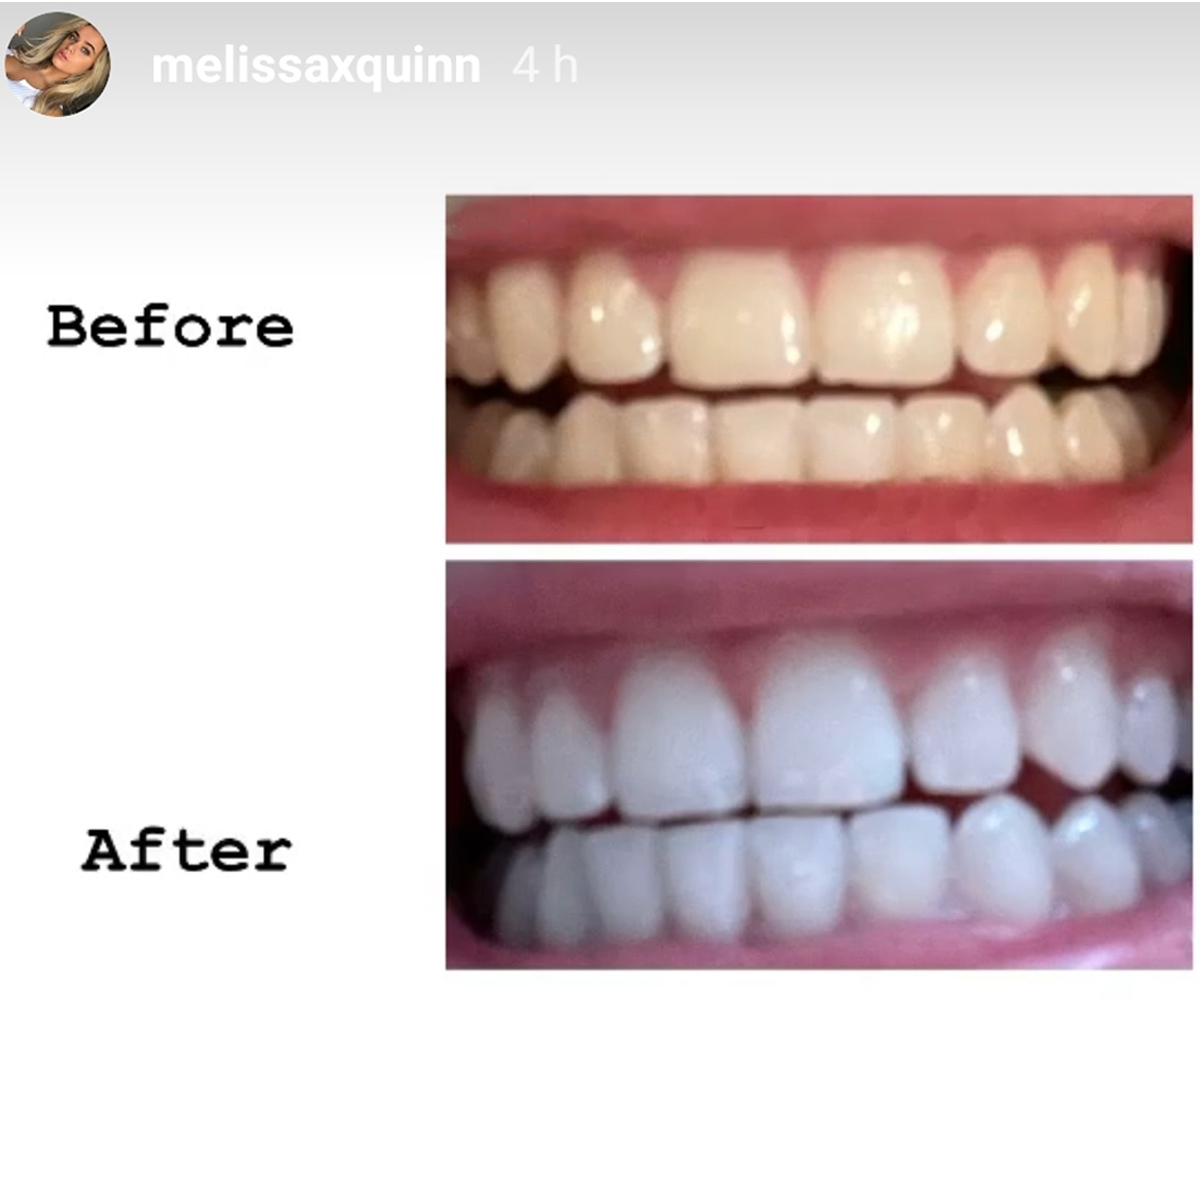 Before & After Melissaquinn Website